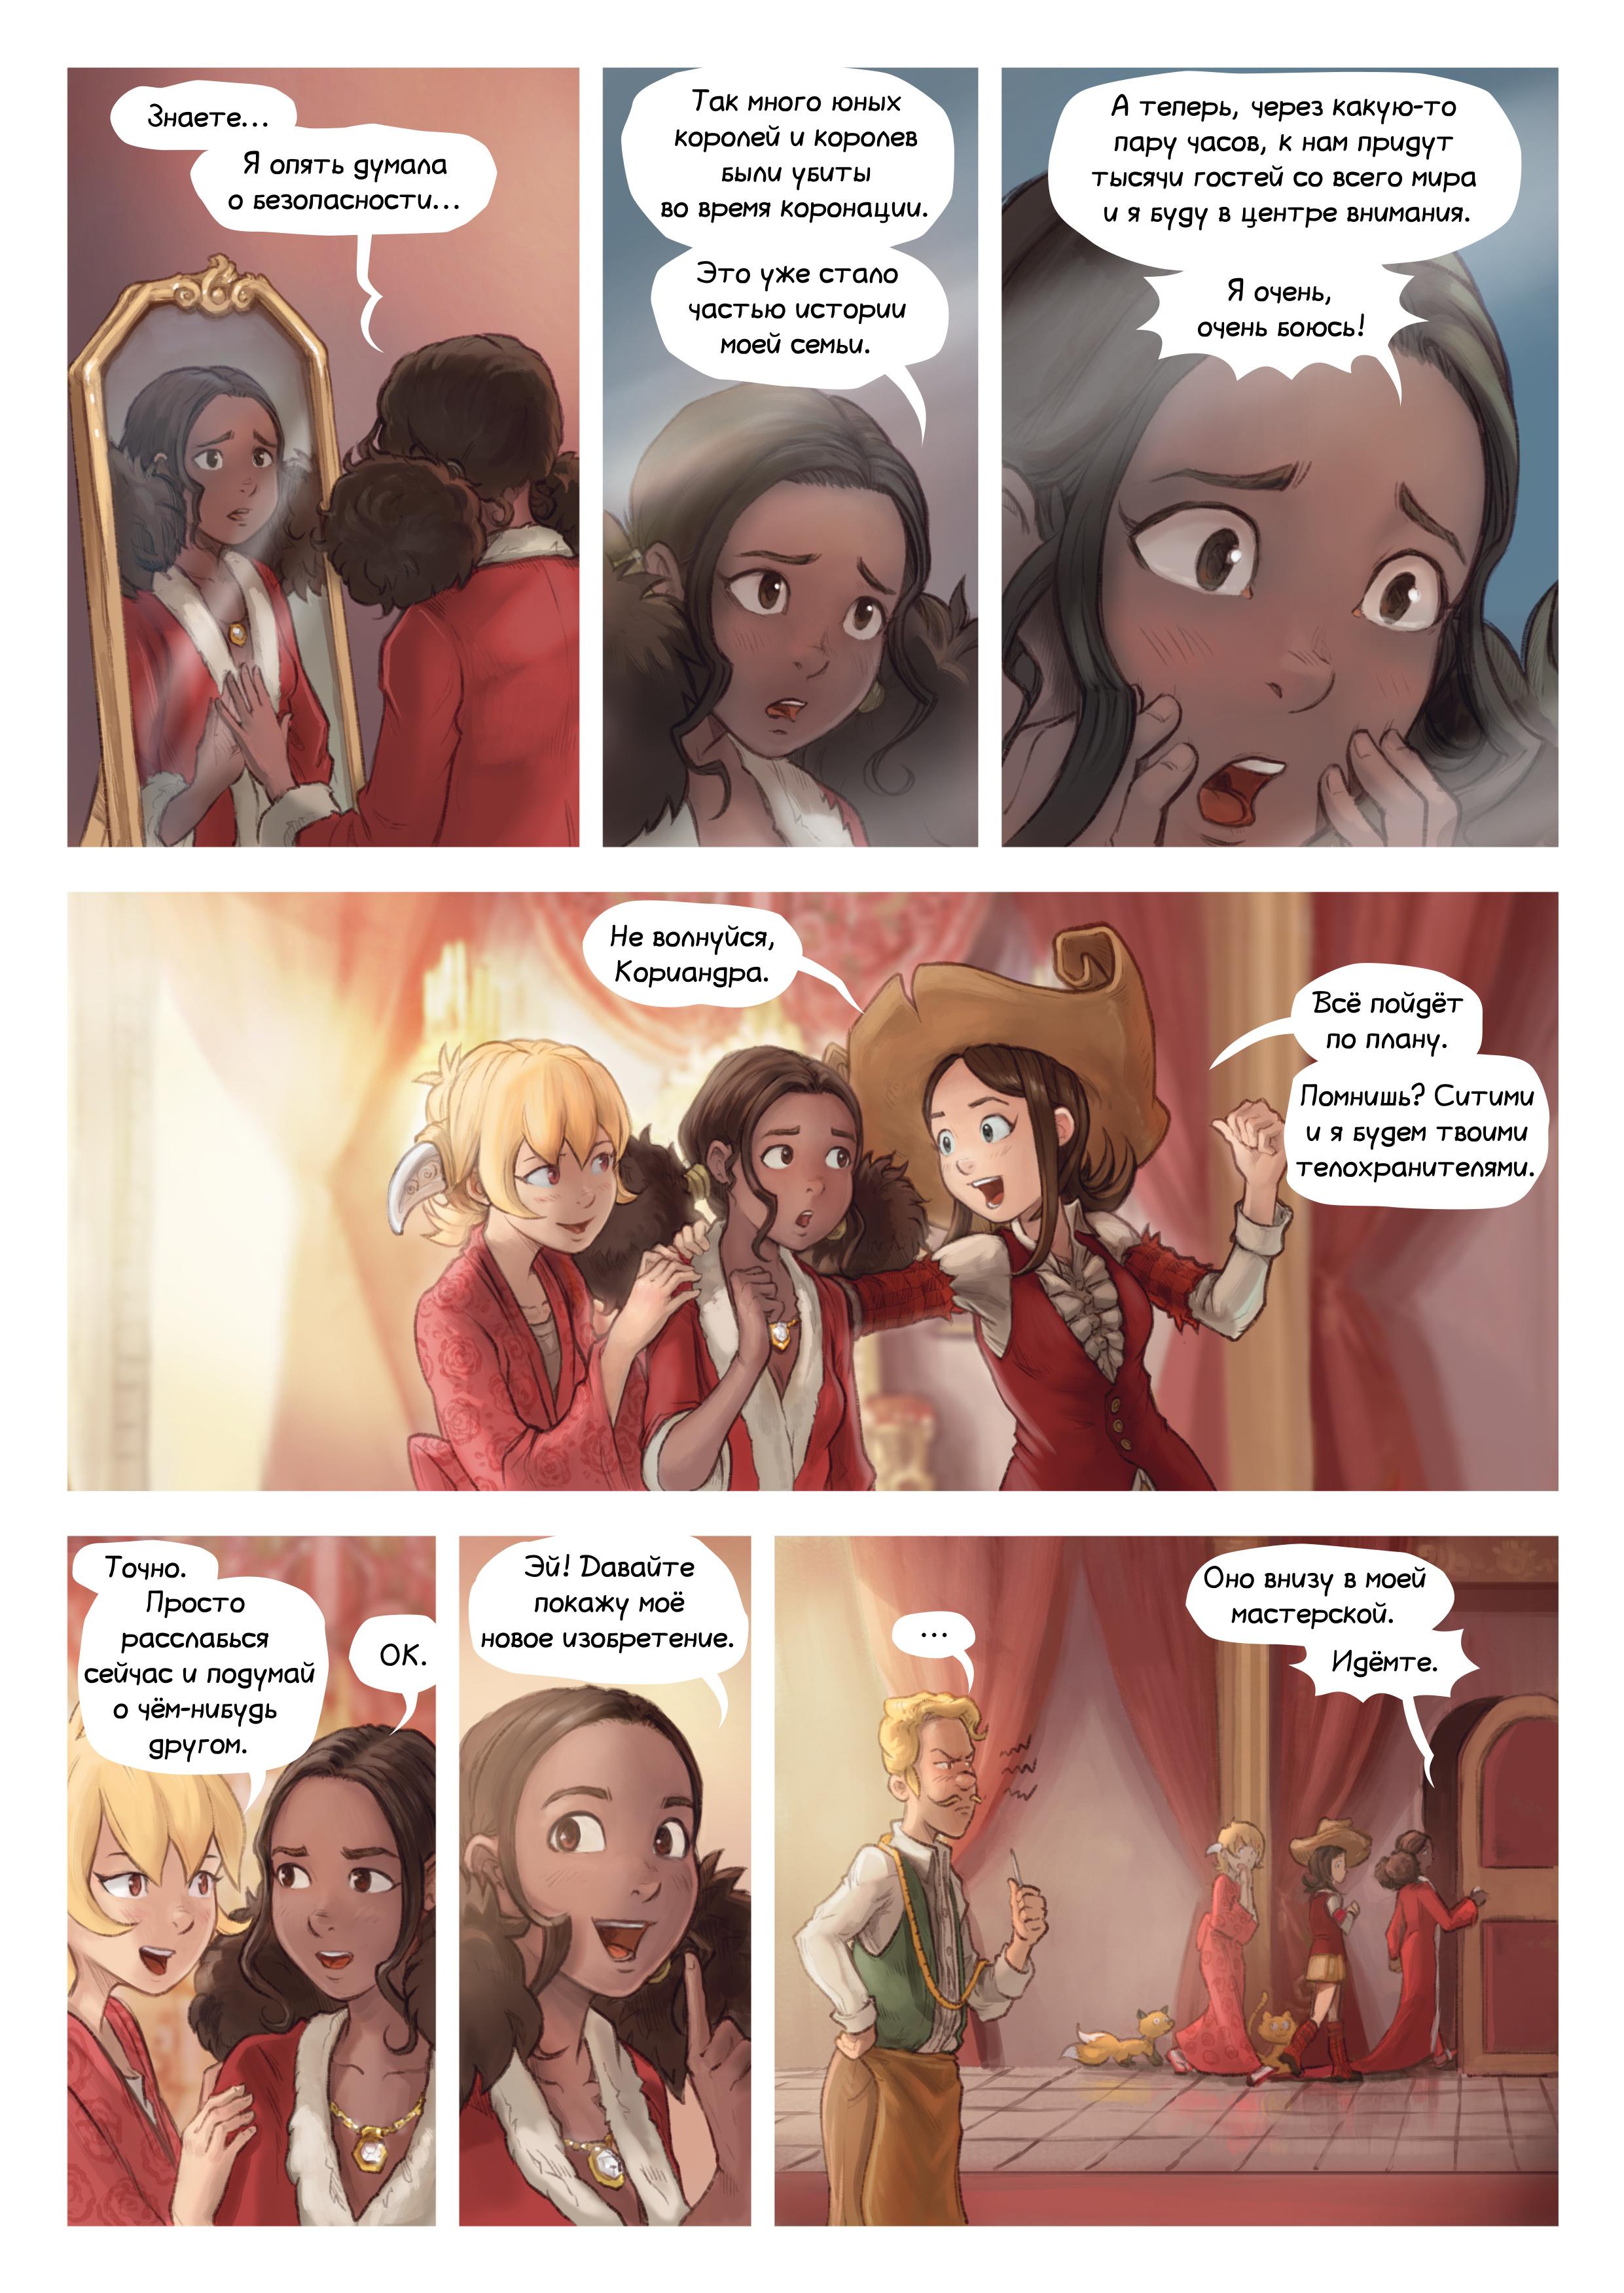 A webcomic page of Pepper&Carrot, эпизод 27 [ru], стр. 2